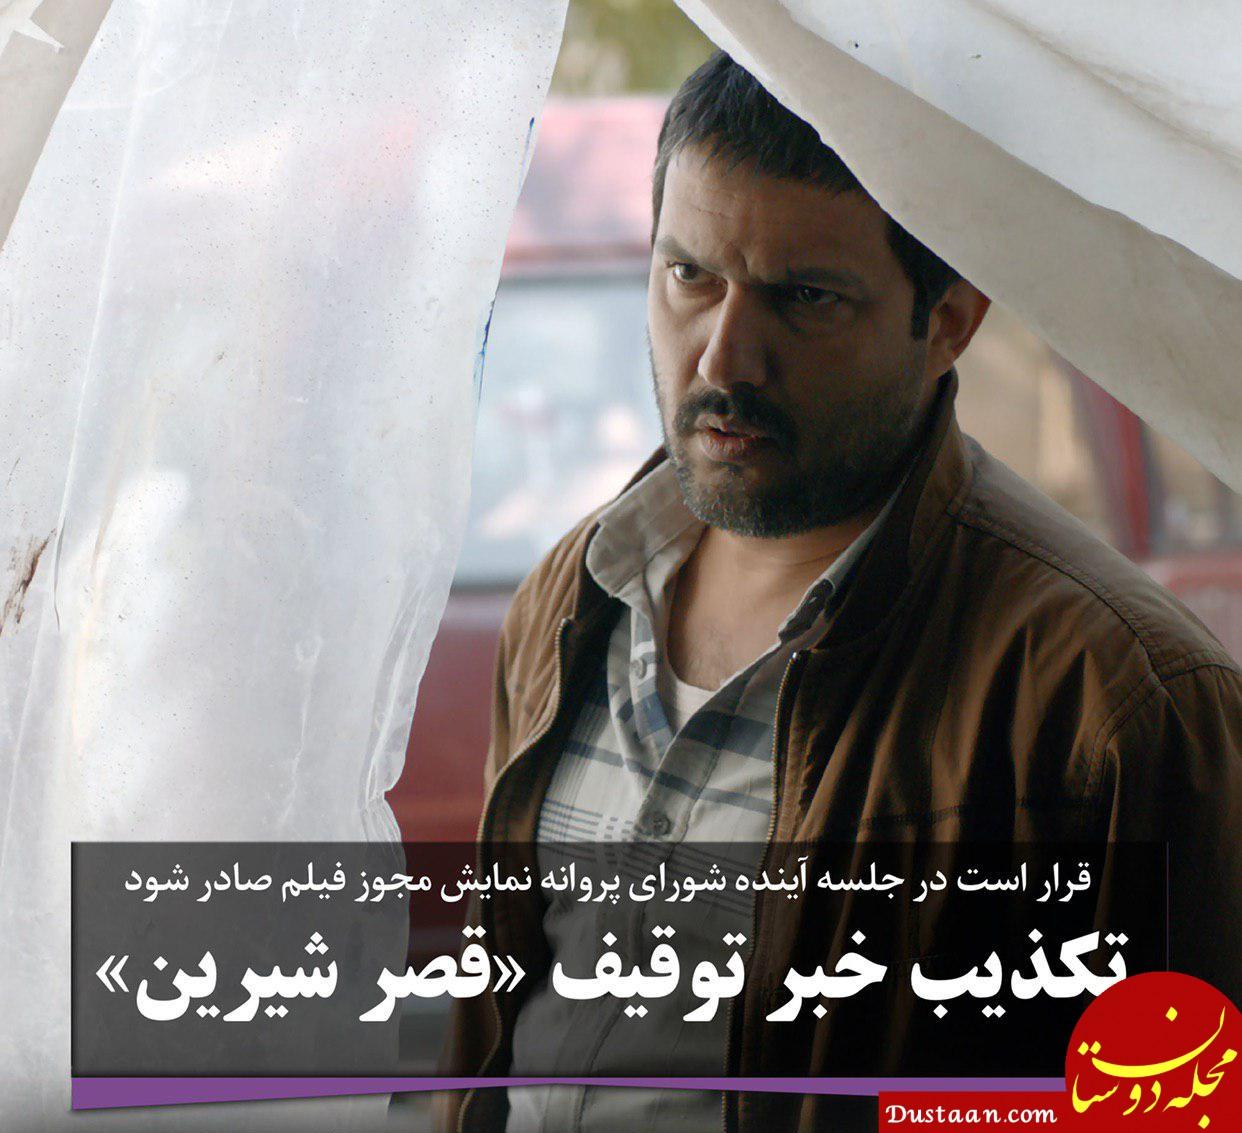 www.dustaan.com تکذیب توقیف قصر شیرین